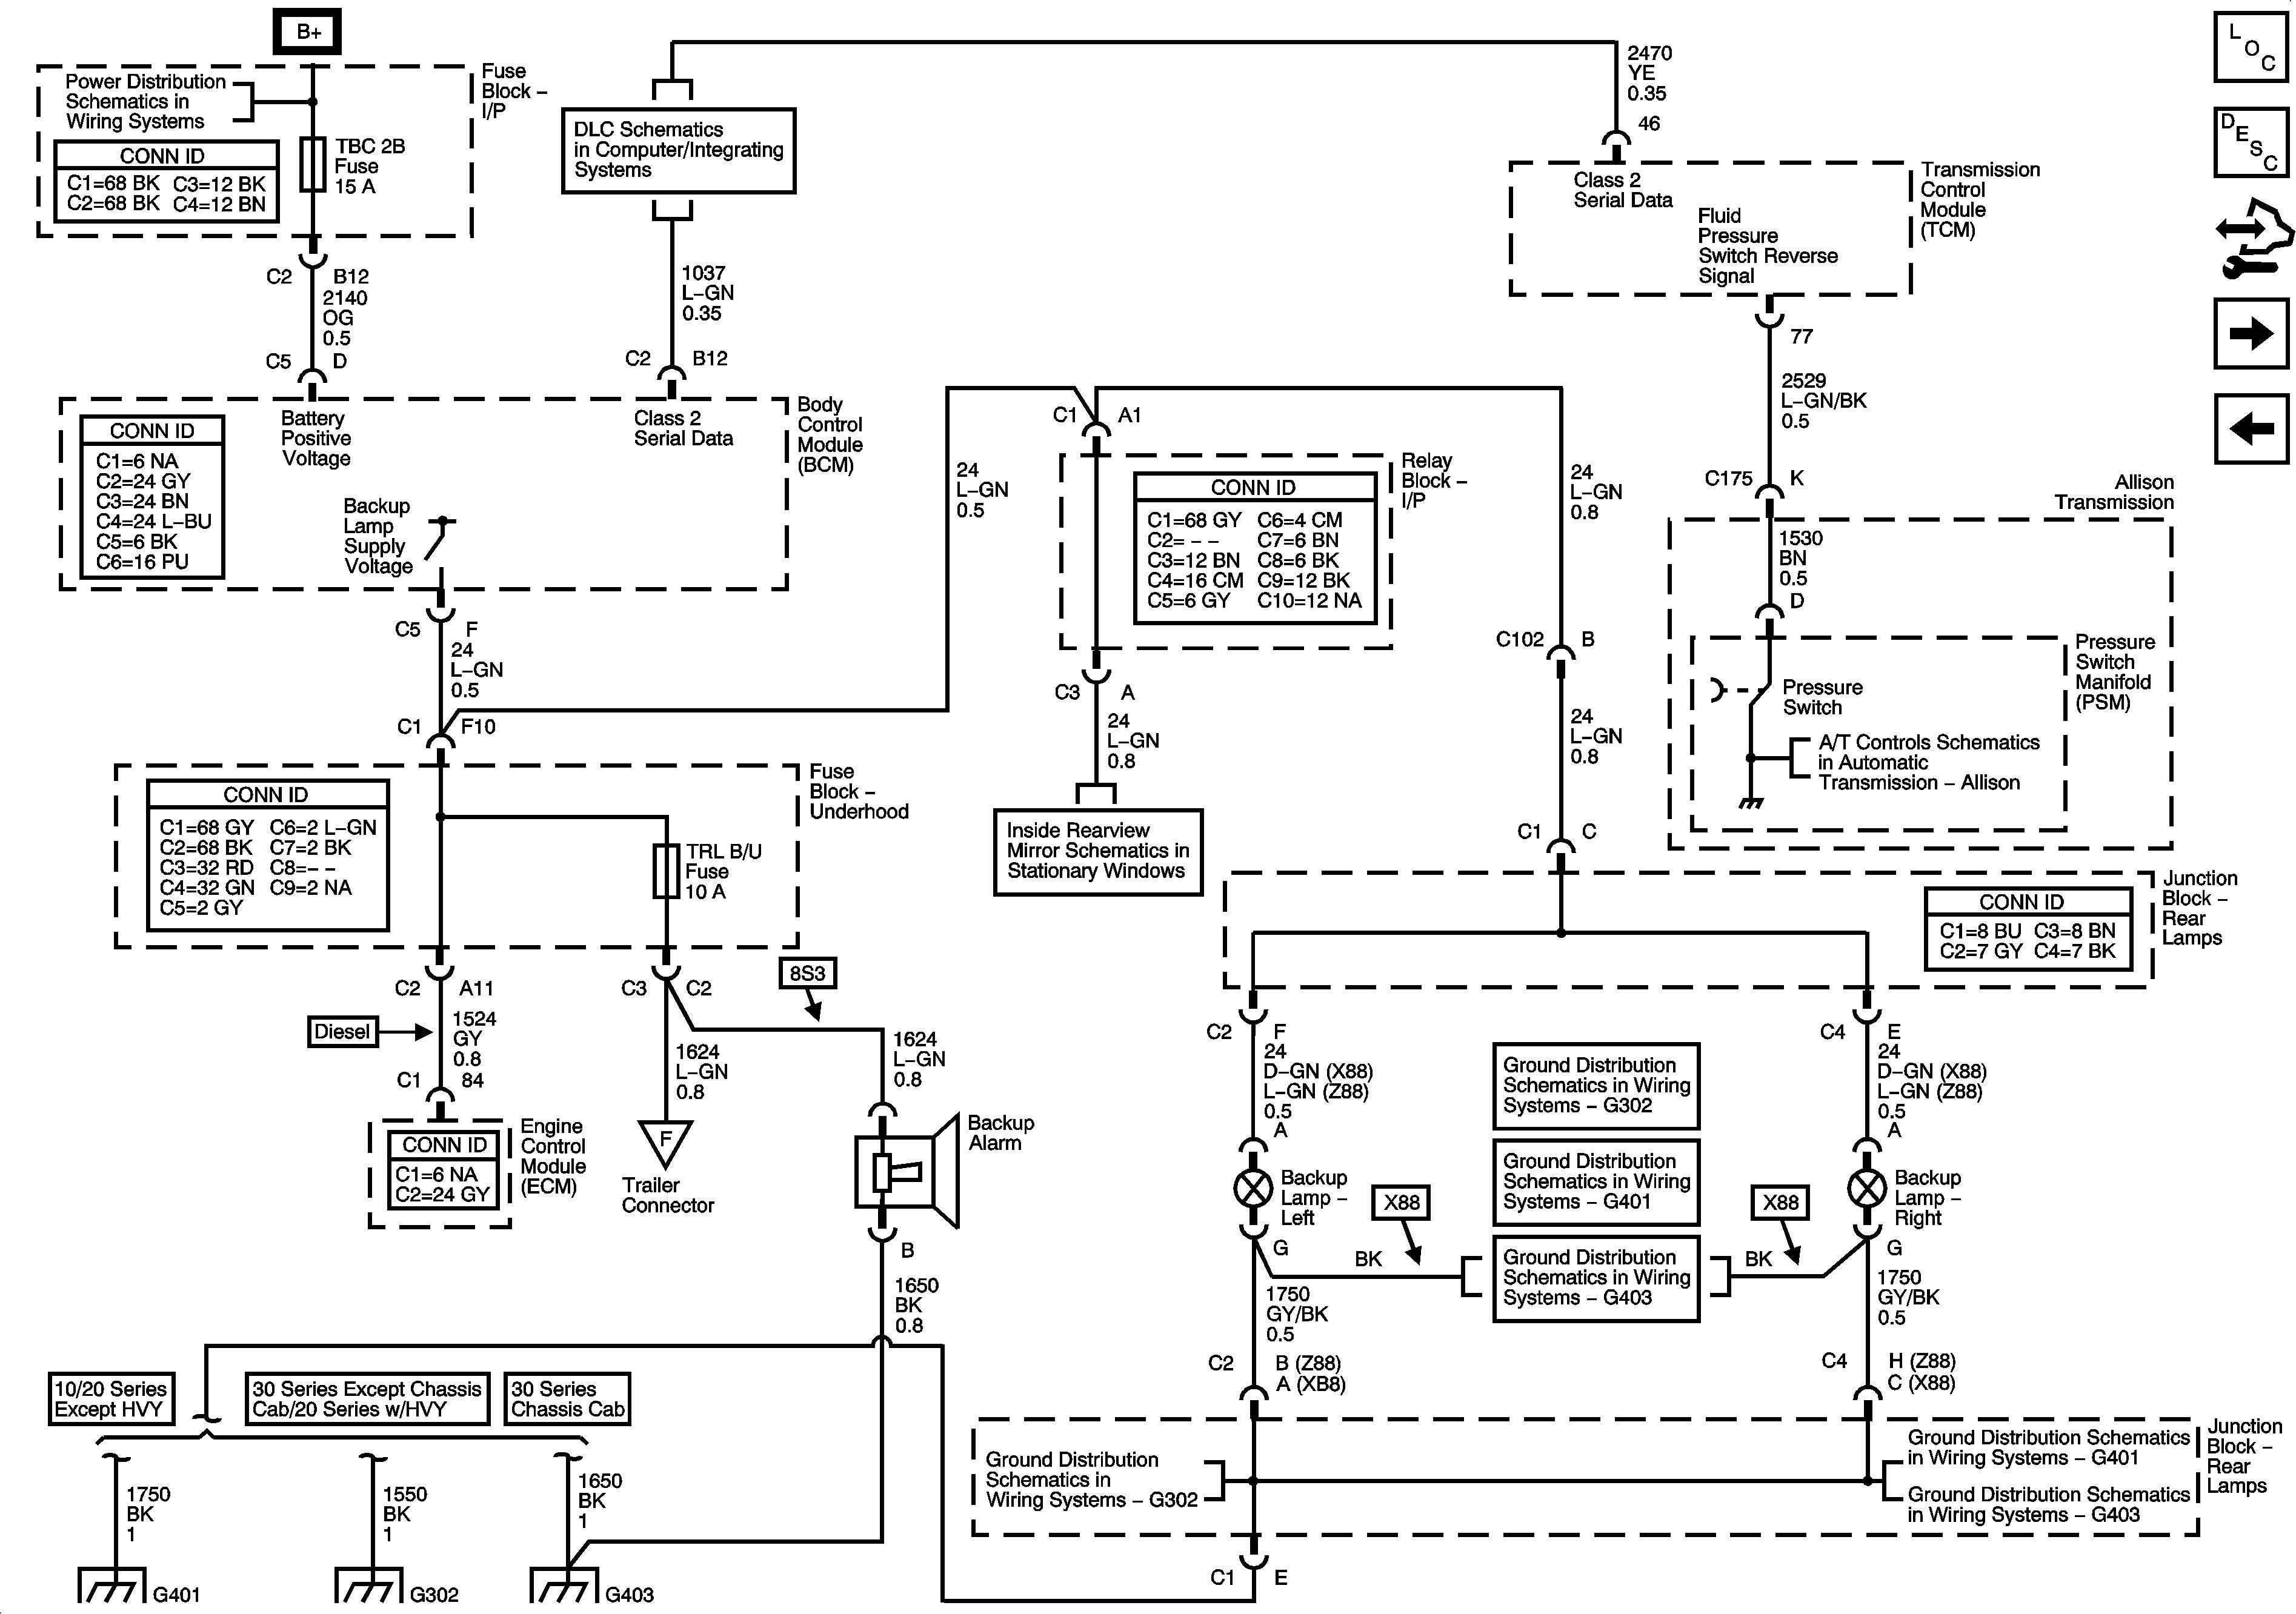 2015 Chevy Silverado Speaker Wiring Diagram Rate 2006 Ford Expedition Wiring Diagram 0d – Wiring Diagram Collection